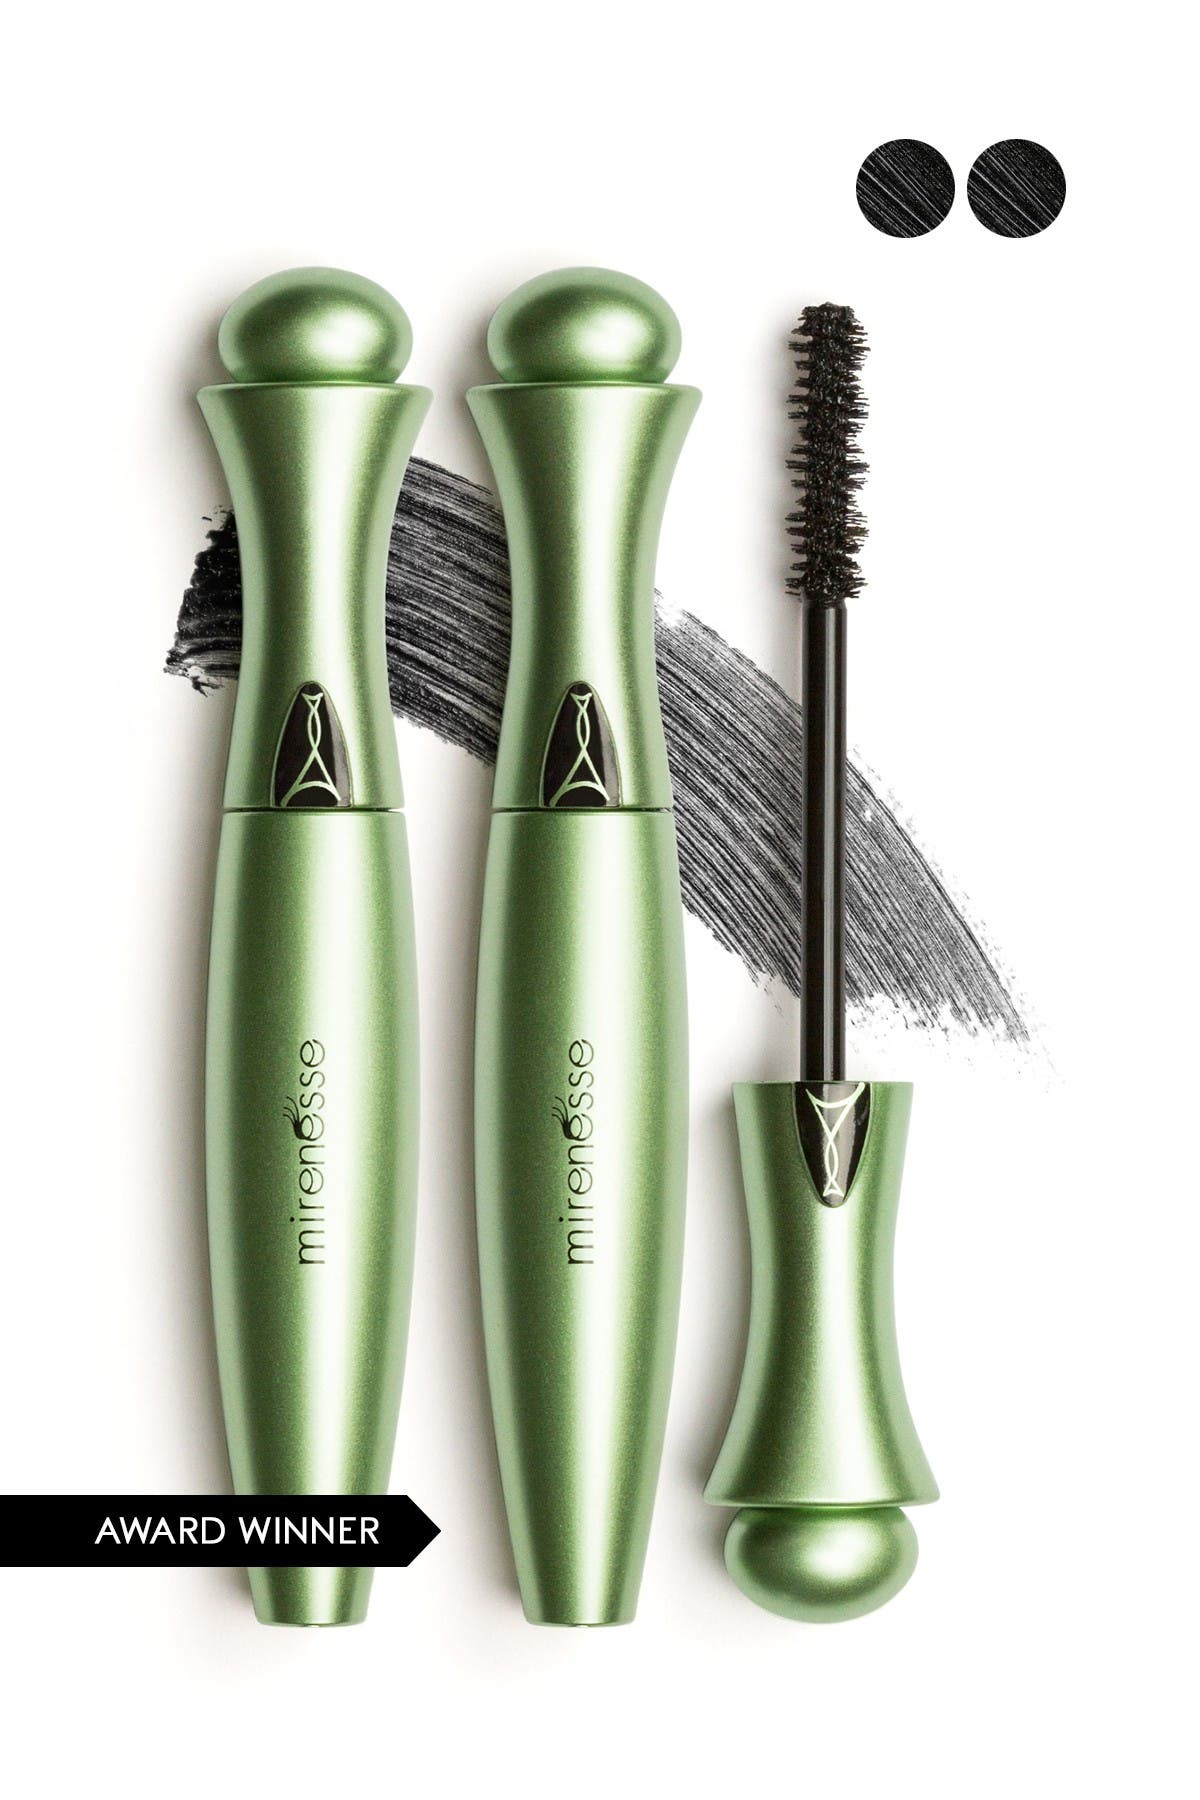 Image of Mirenesse Organic Secret Weapon 24-Hour Mascara - Black - Set of 2